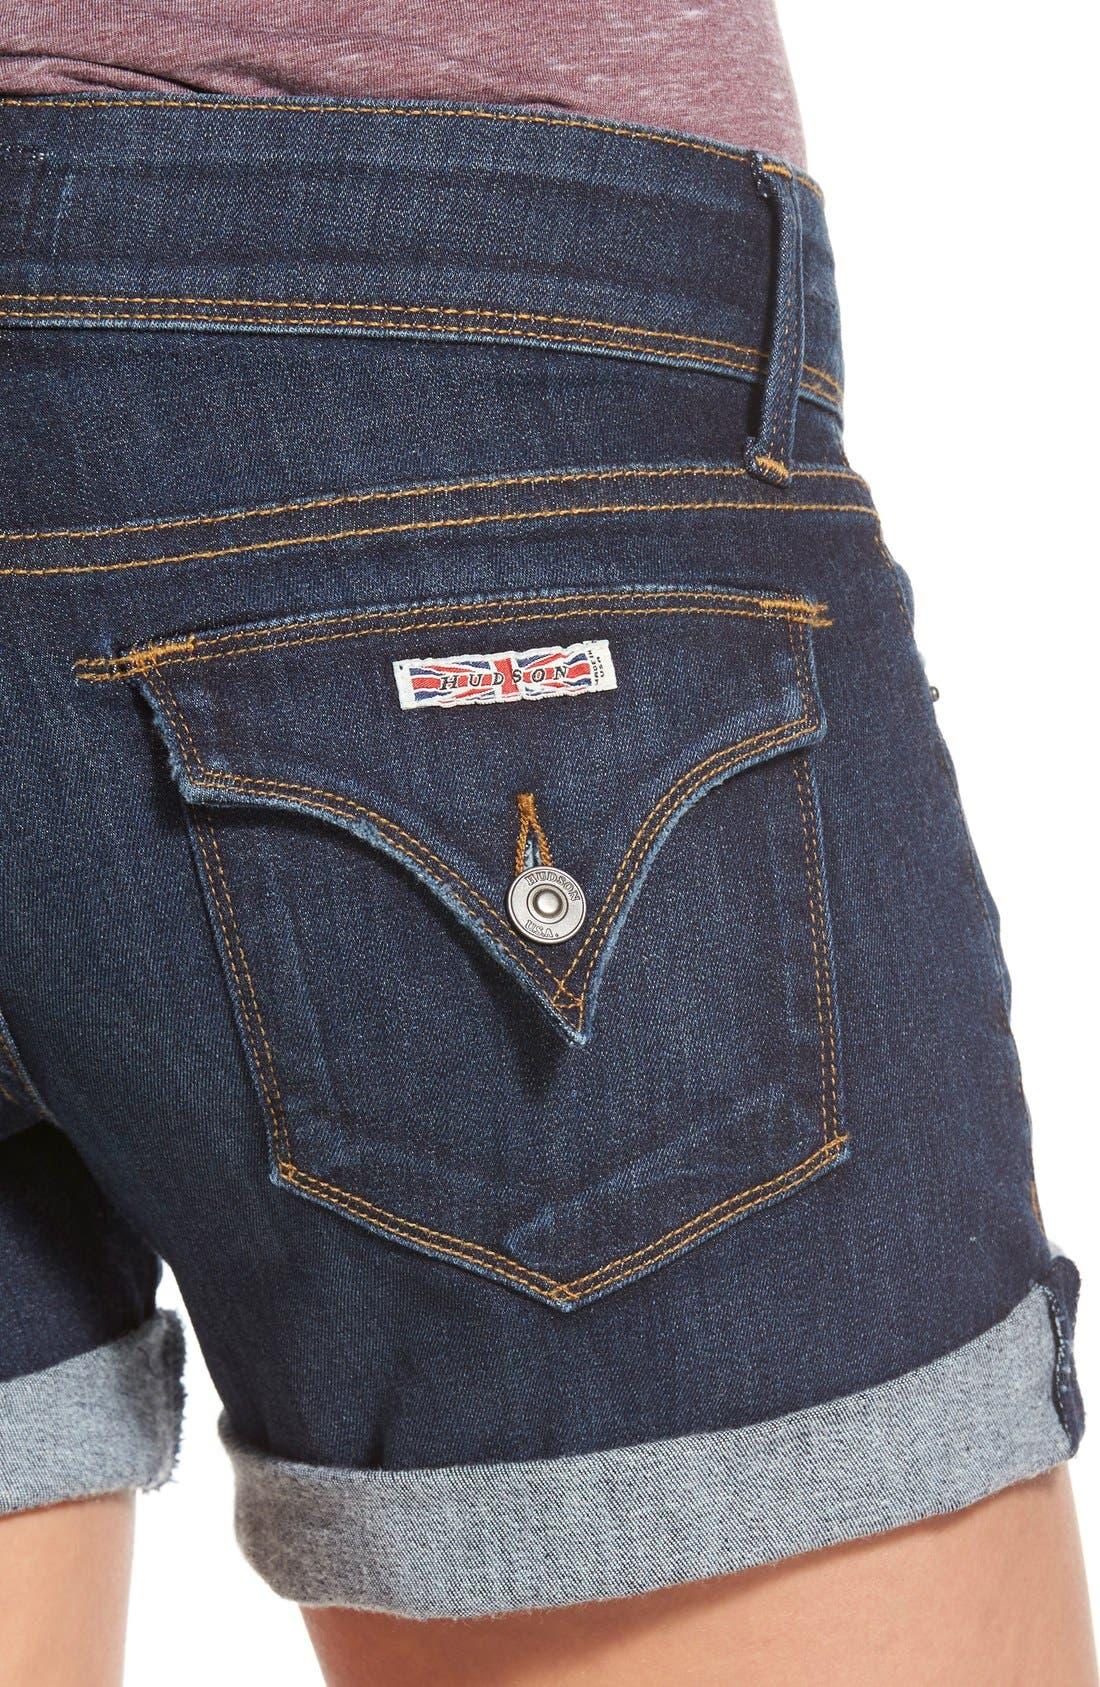 'Croxley' Cuffed Denim Shorts,                             Alternate thumbnail 4, color,                             Elemental